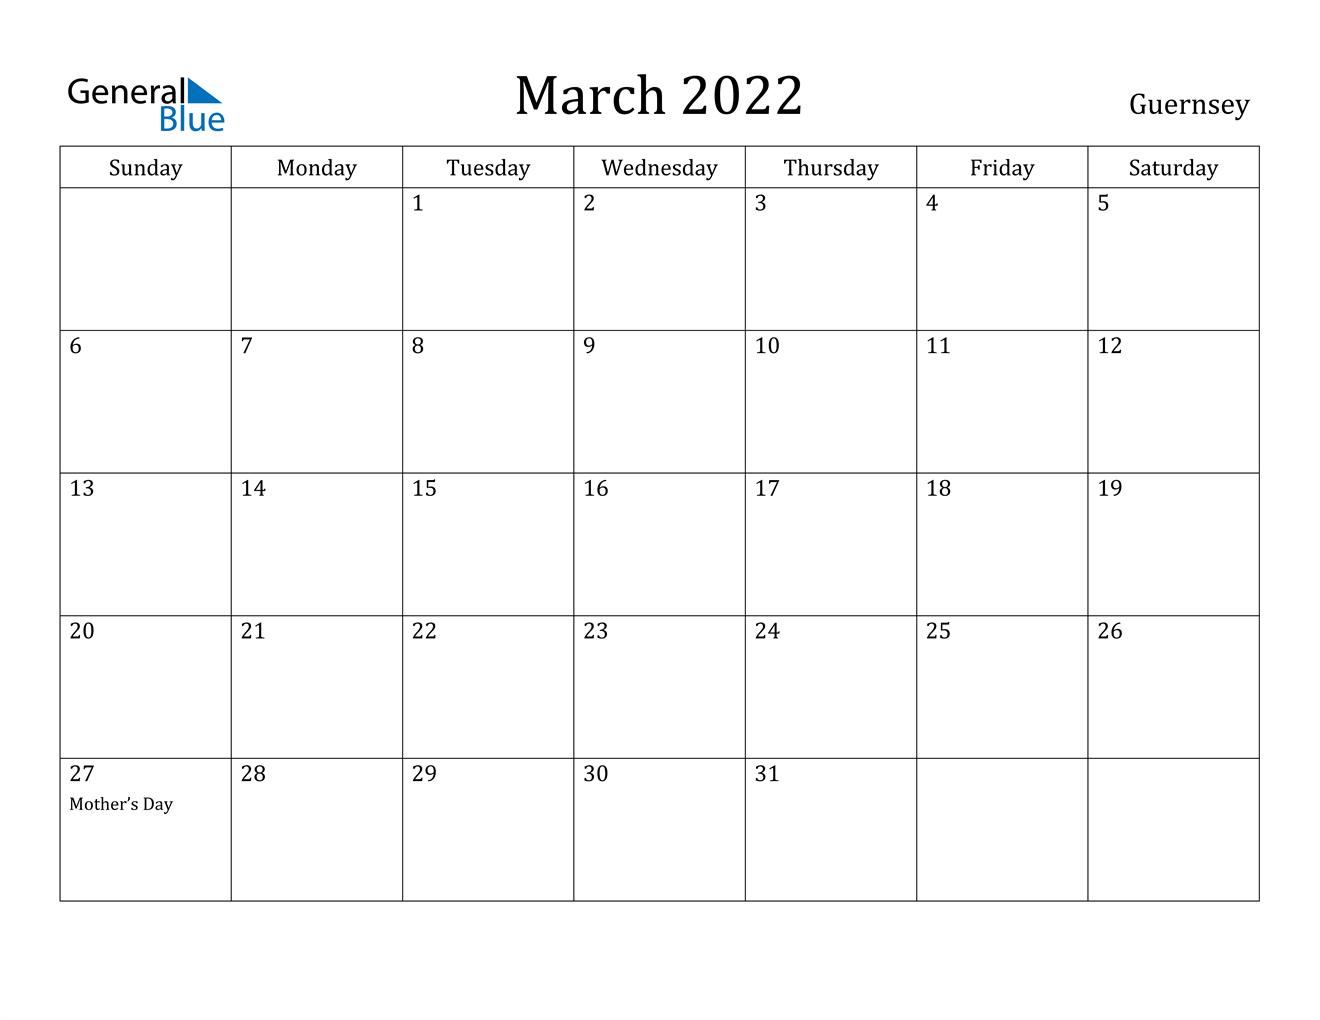 March 2022 Calendar – Guernsey For Calendar Of March 2022